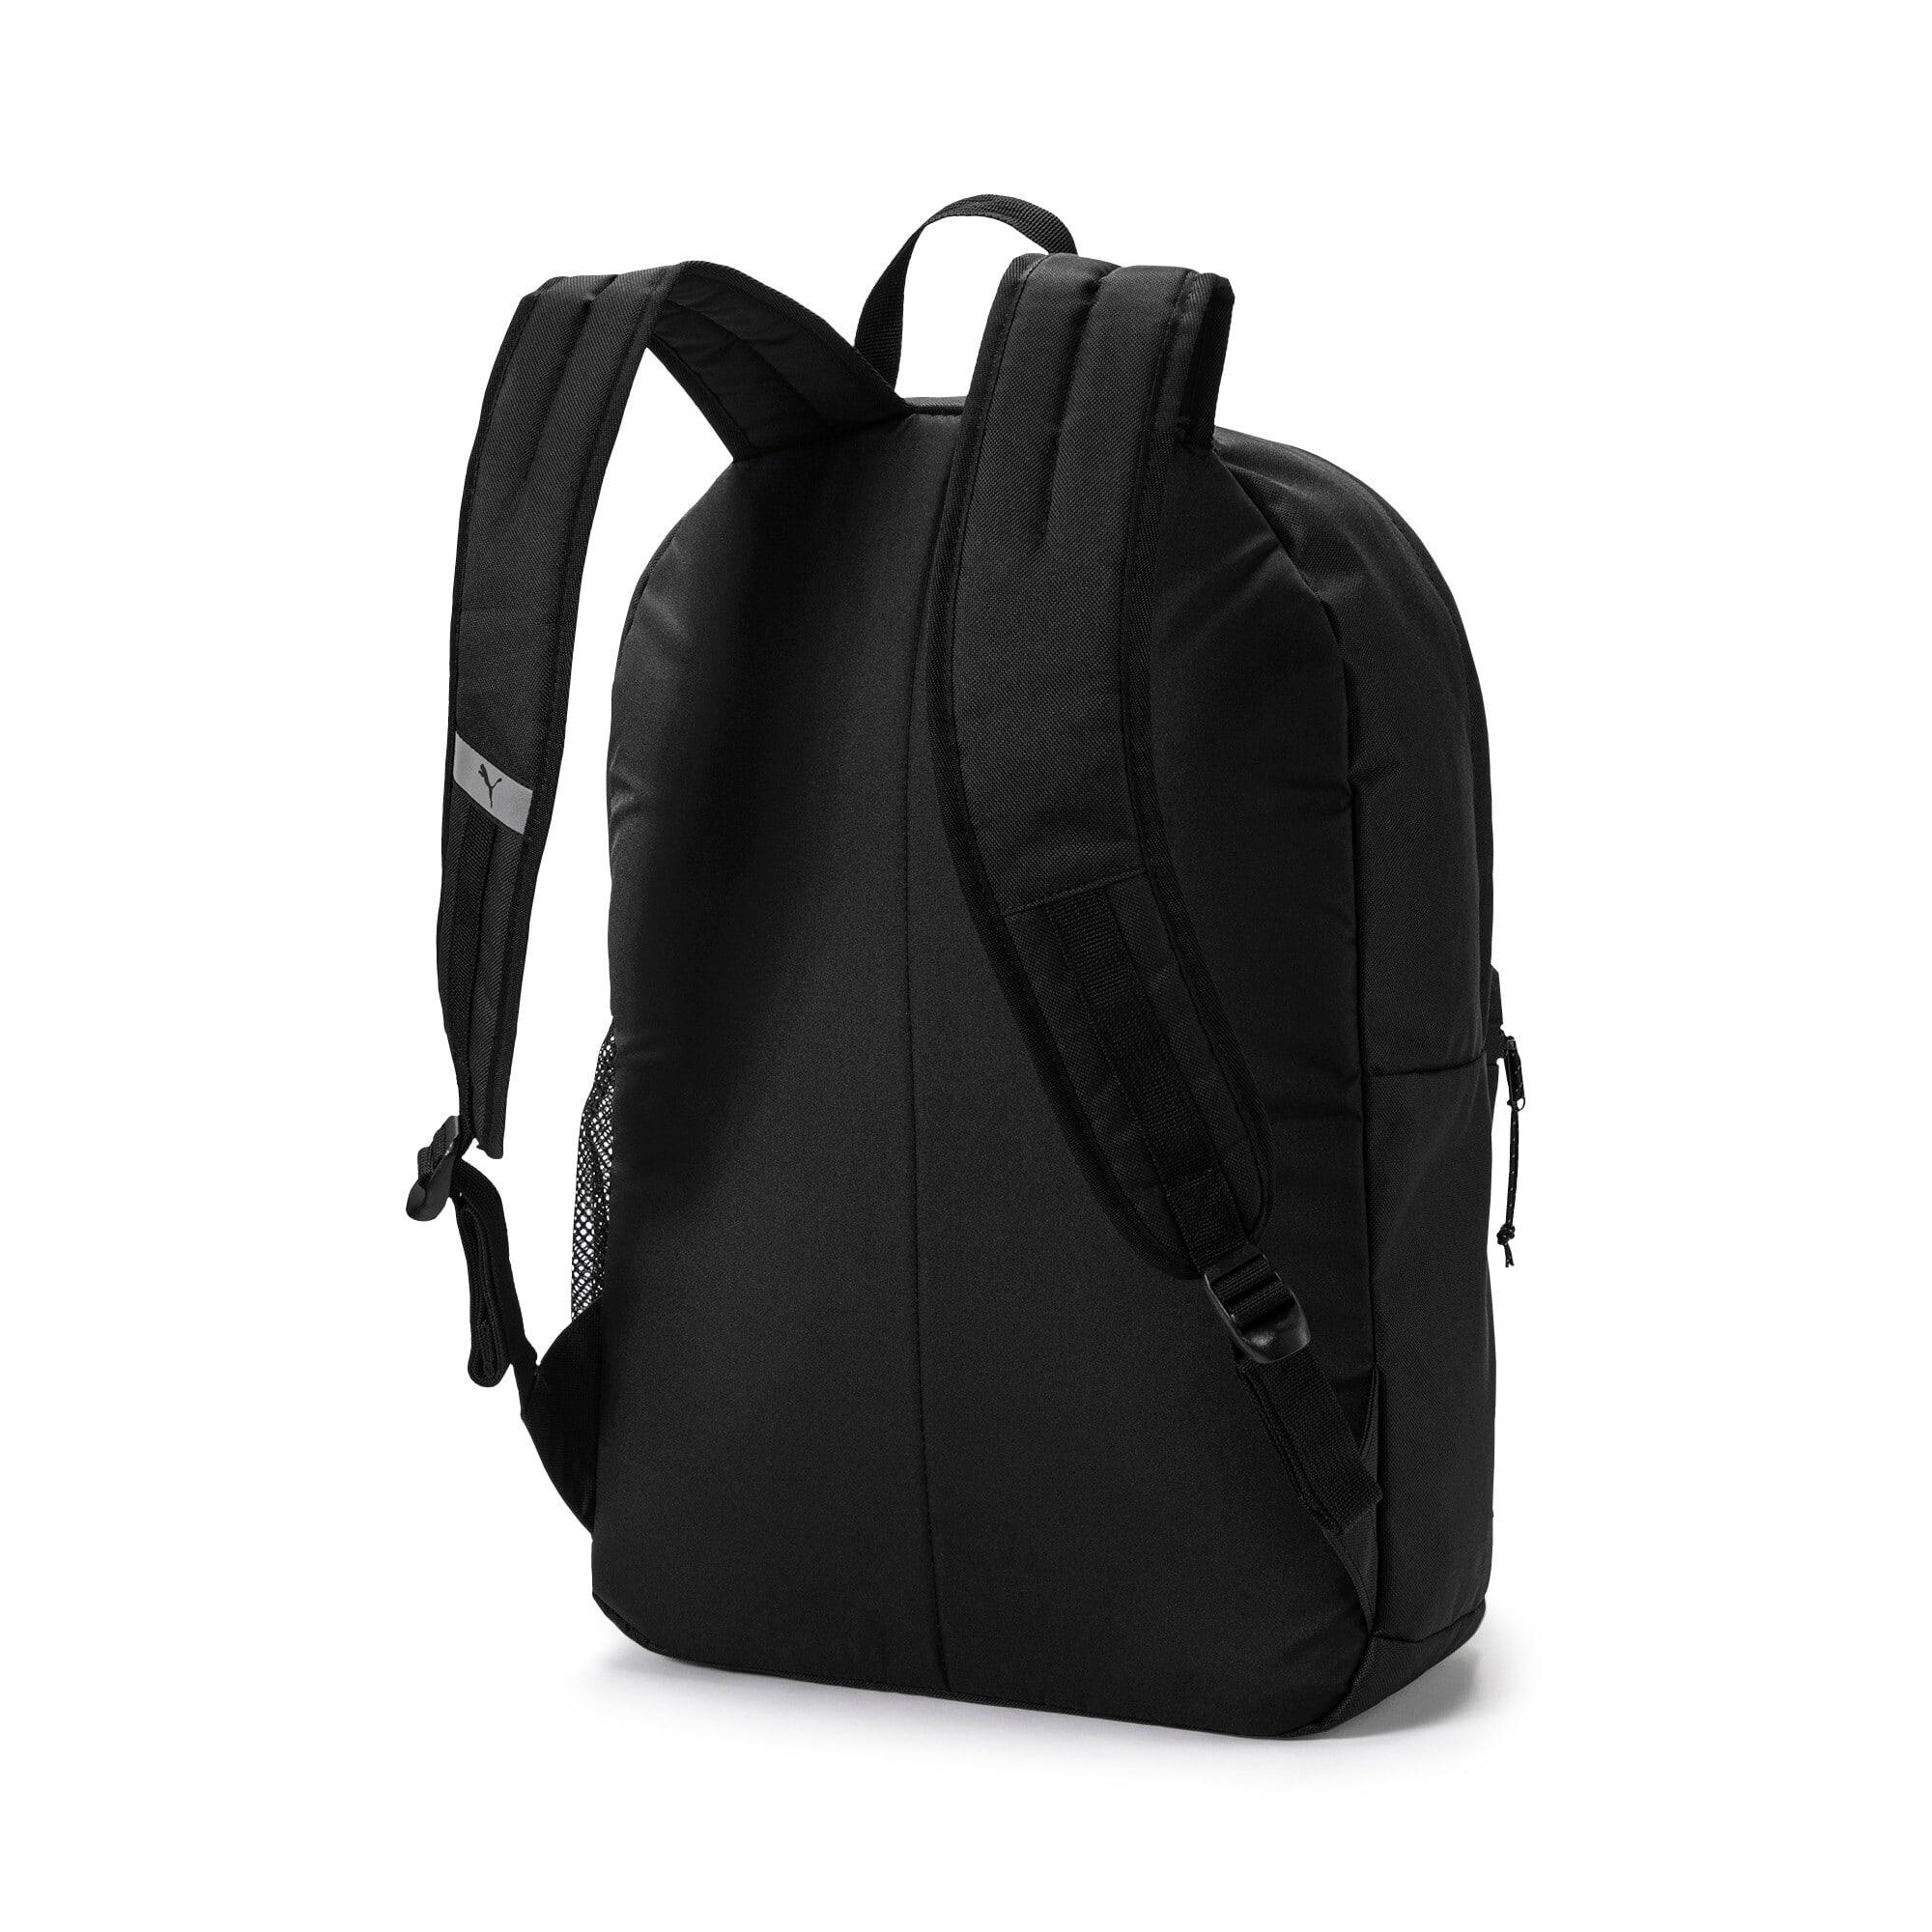 Thumbnail 2 of Academy Backpack, Puma Black, medium